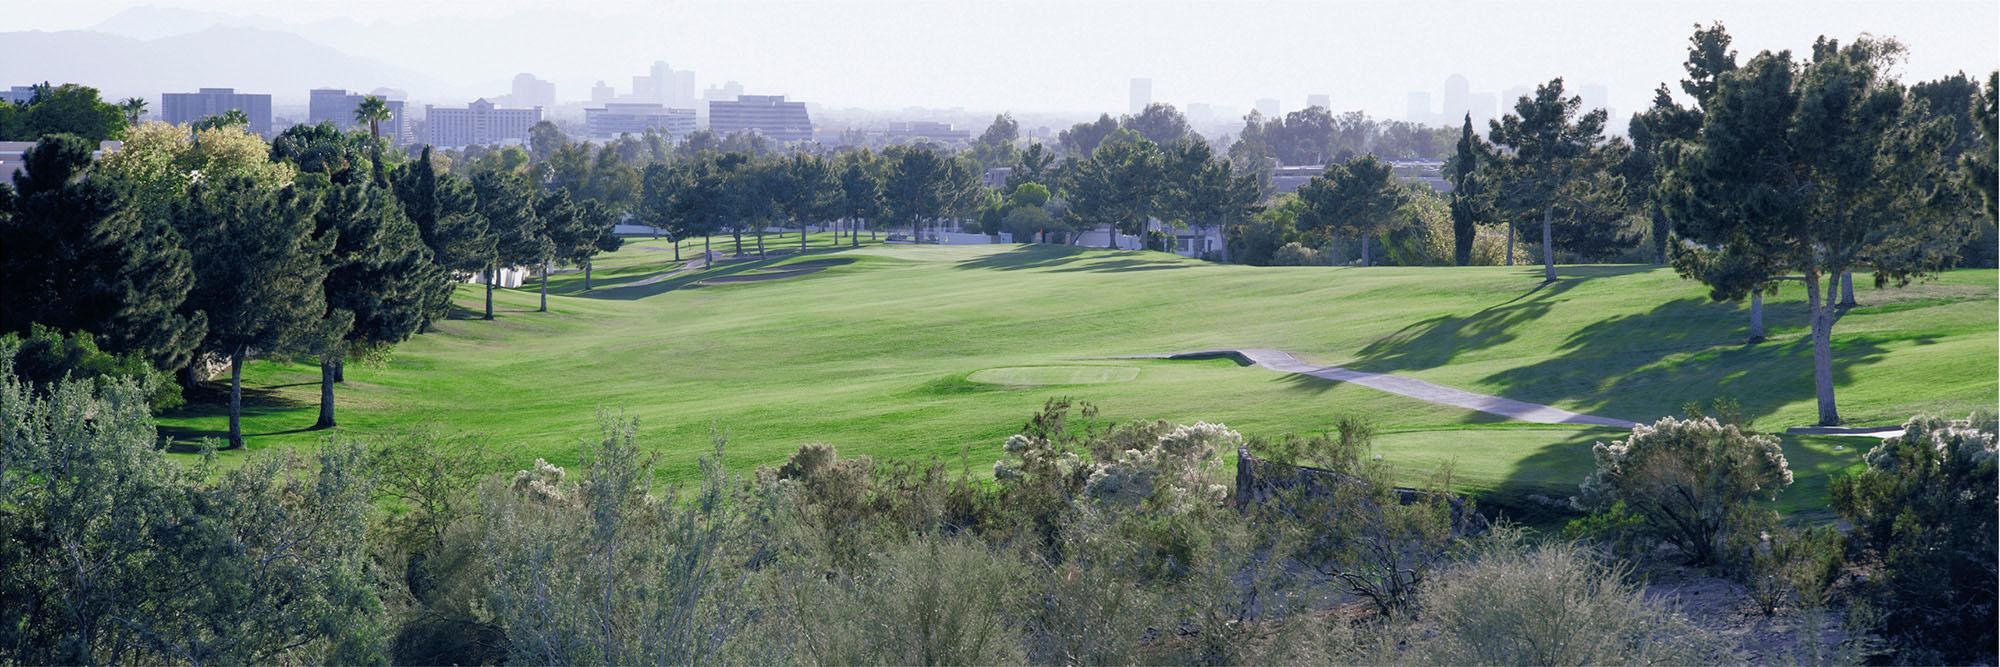 Golf Course Image - Arizona Biltmore No. 17